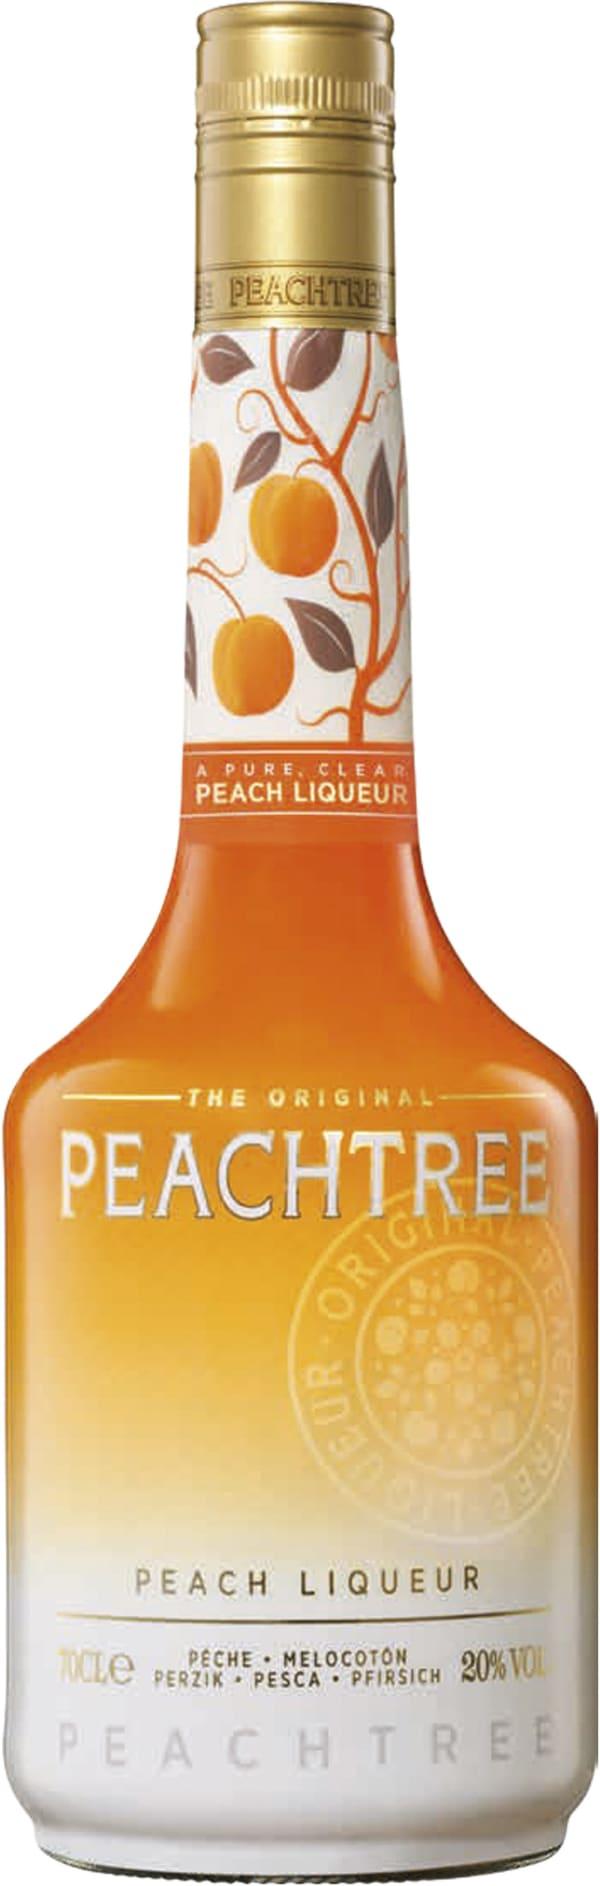 The Original Peachtree